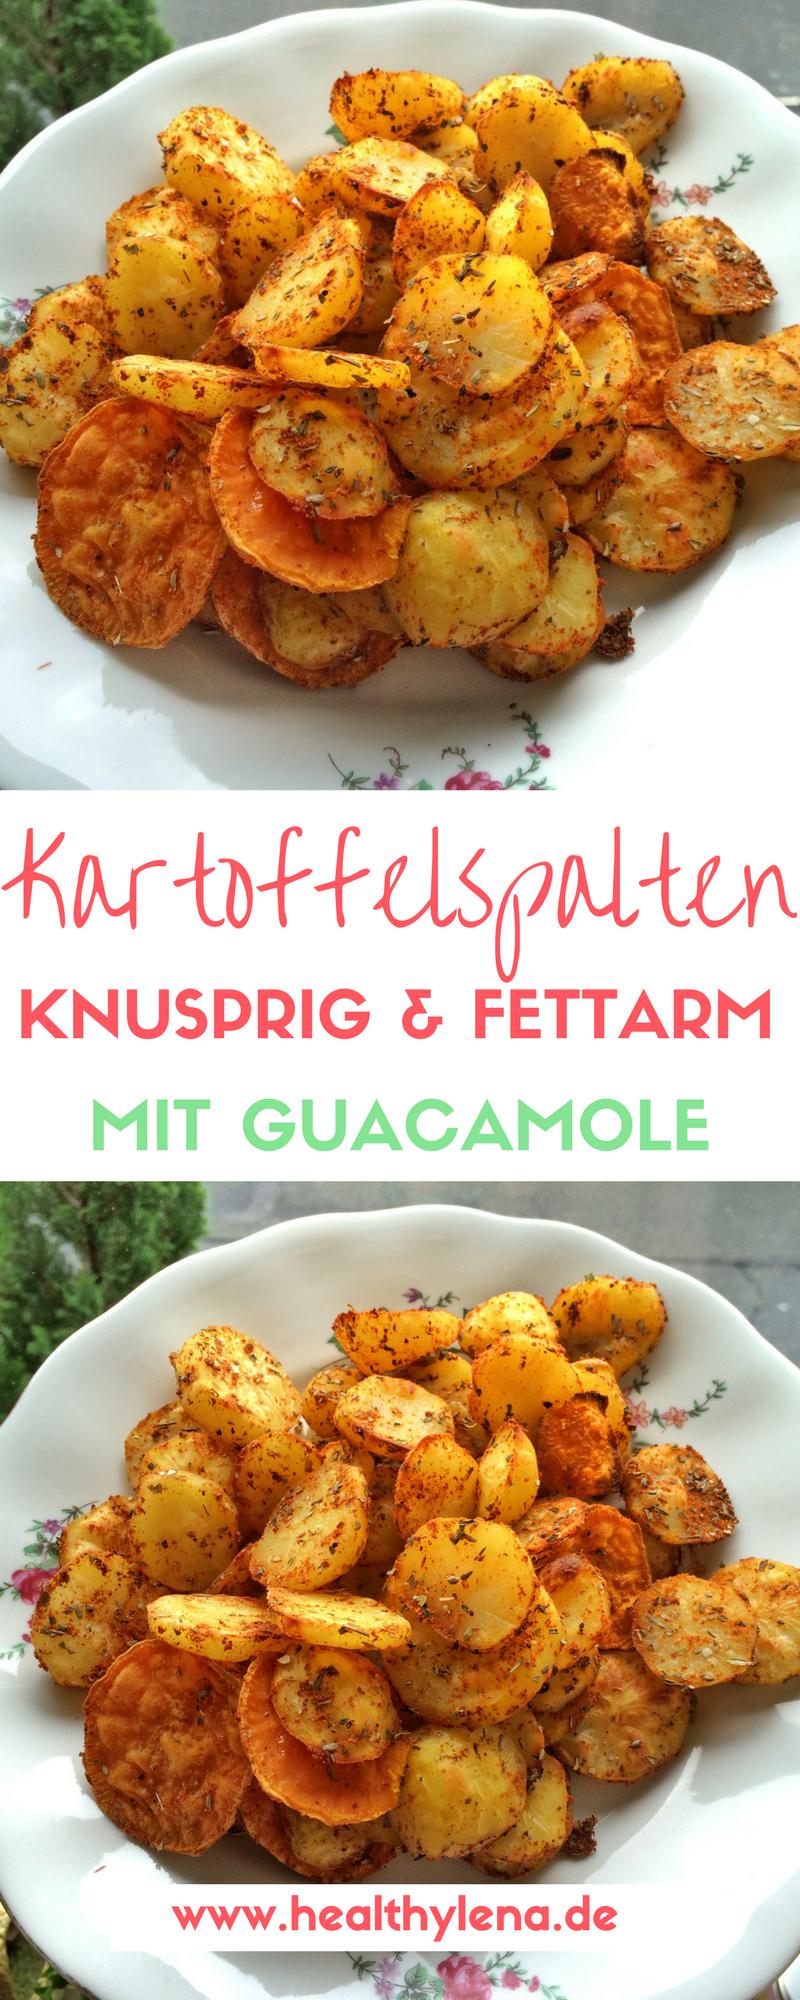 Knusprige fettarme Kartoffelecken mit Guacamole #obstgemüse